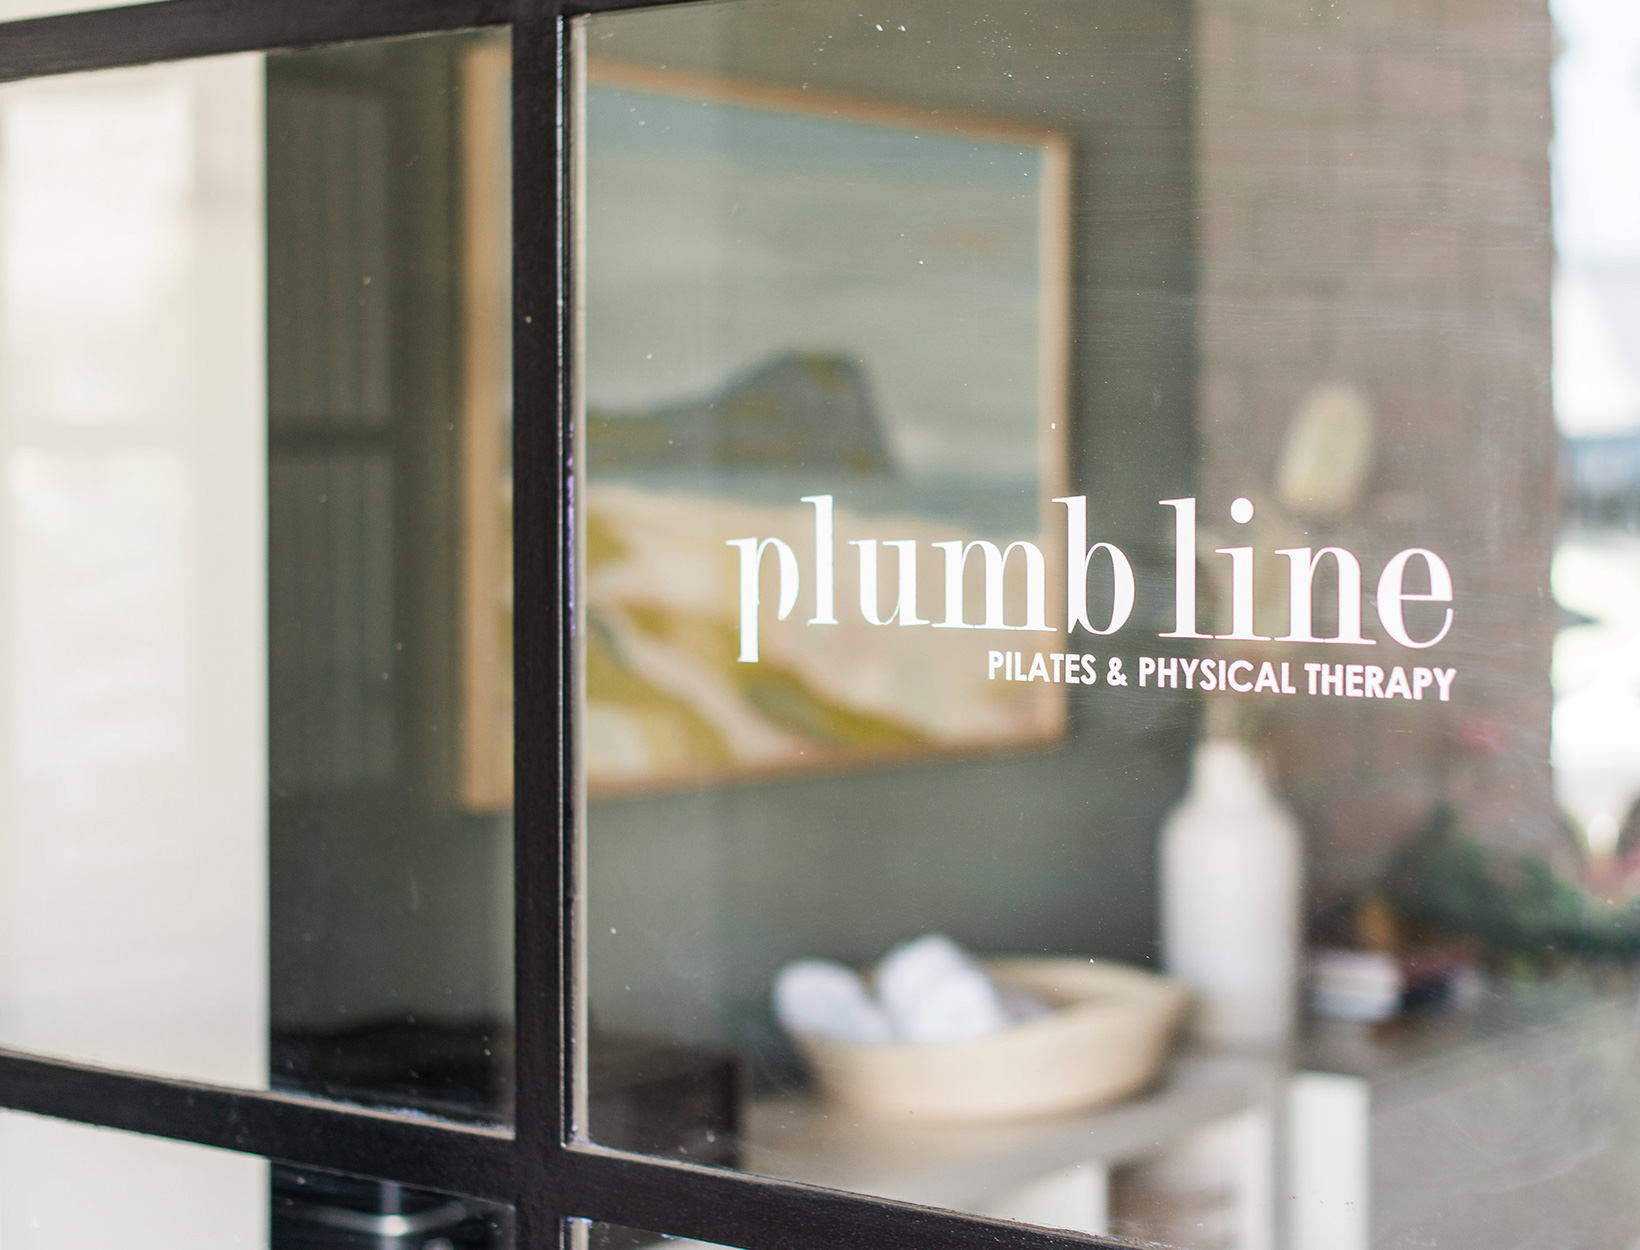 Plumb Line Pilates